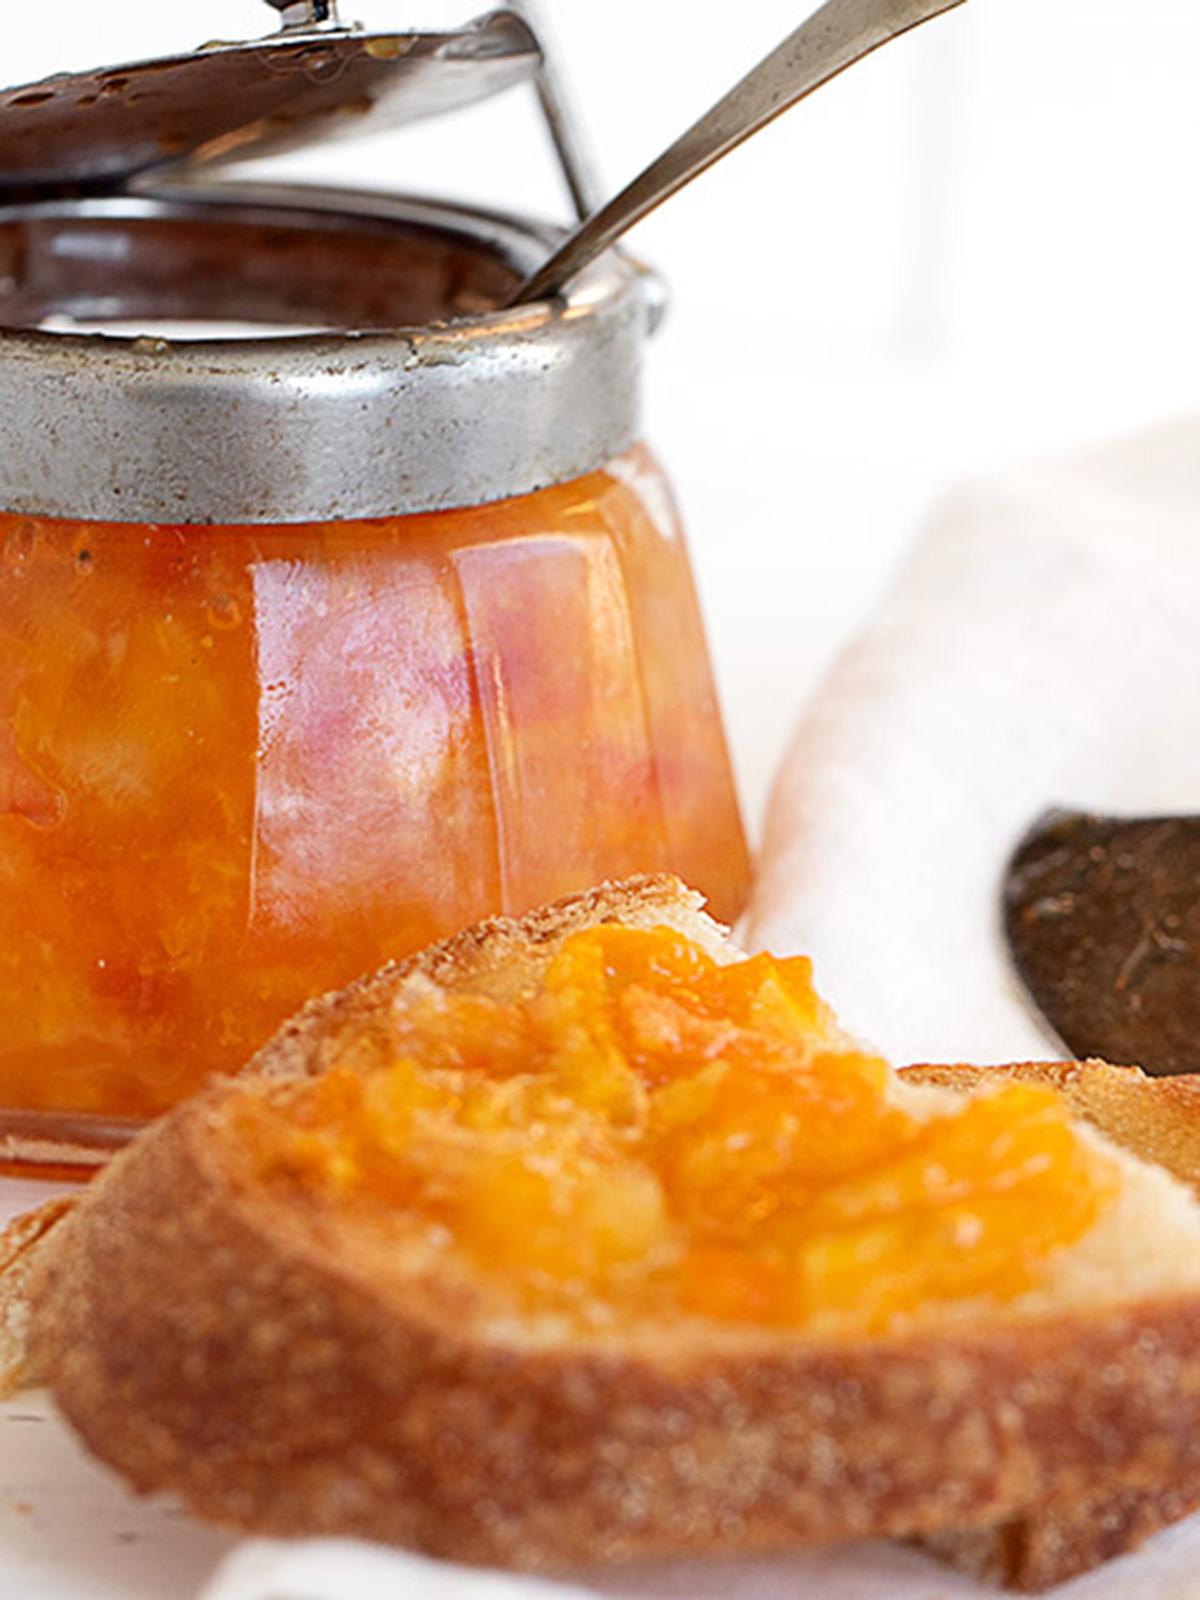 orange marmalade in jar with toast